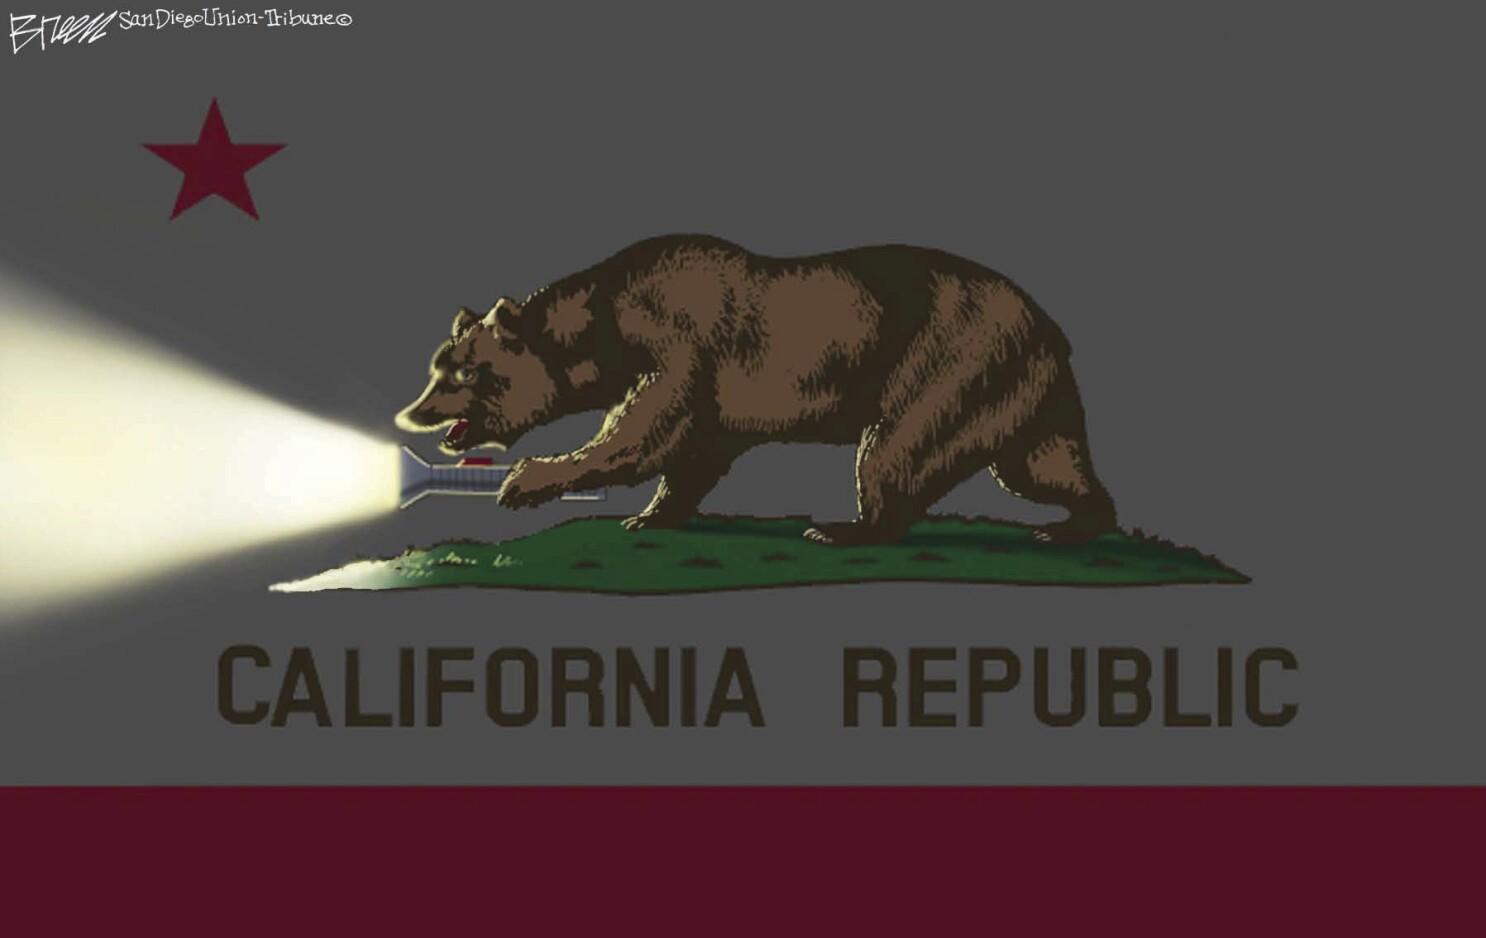 PG&E slammed for cutting power to millions of Californians